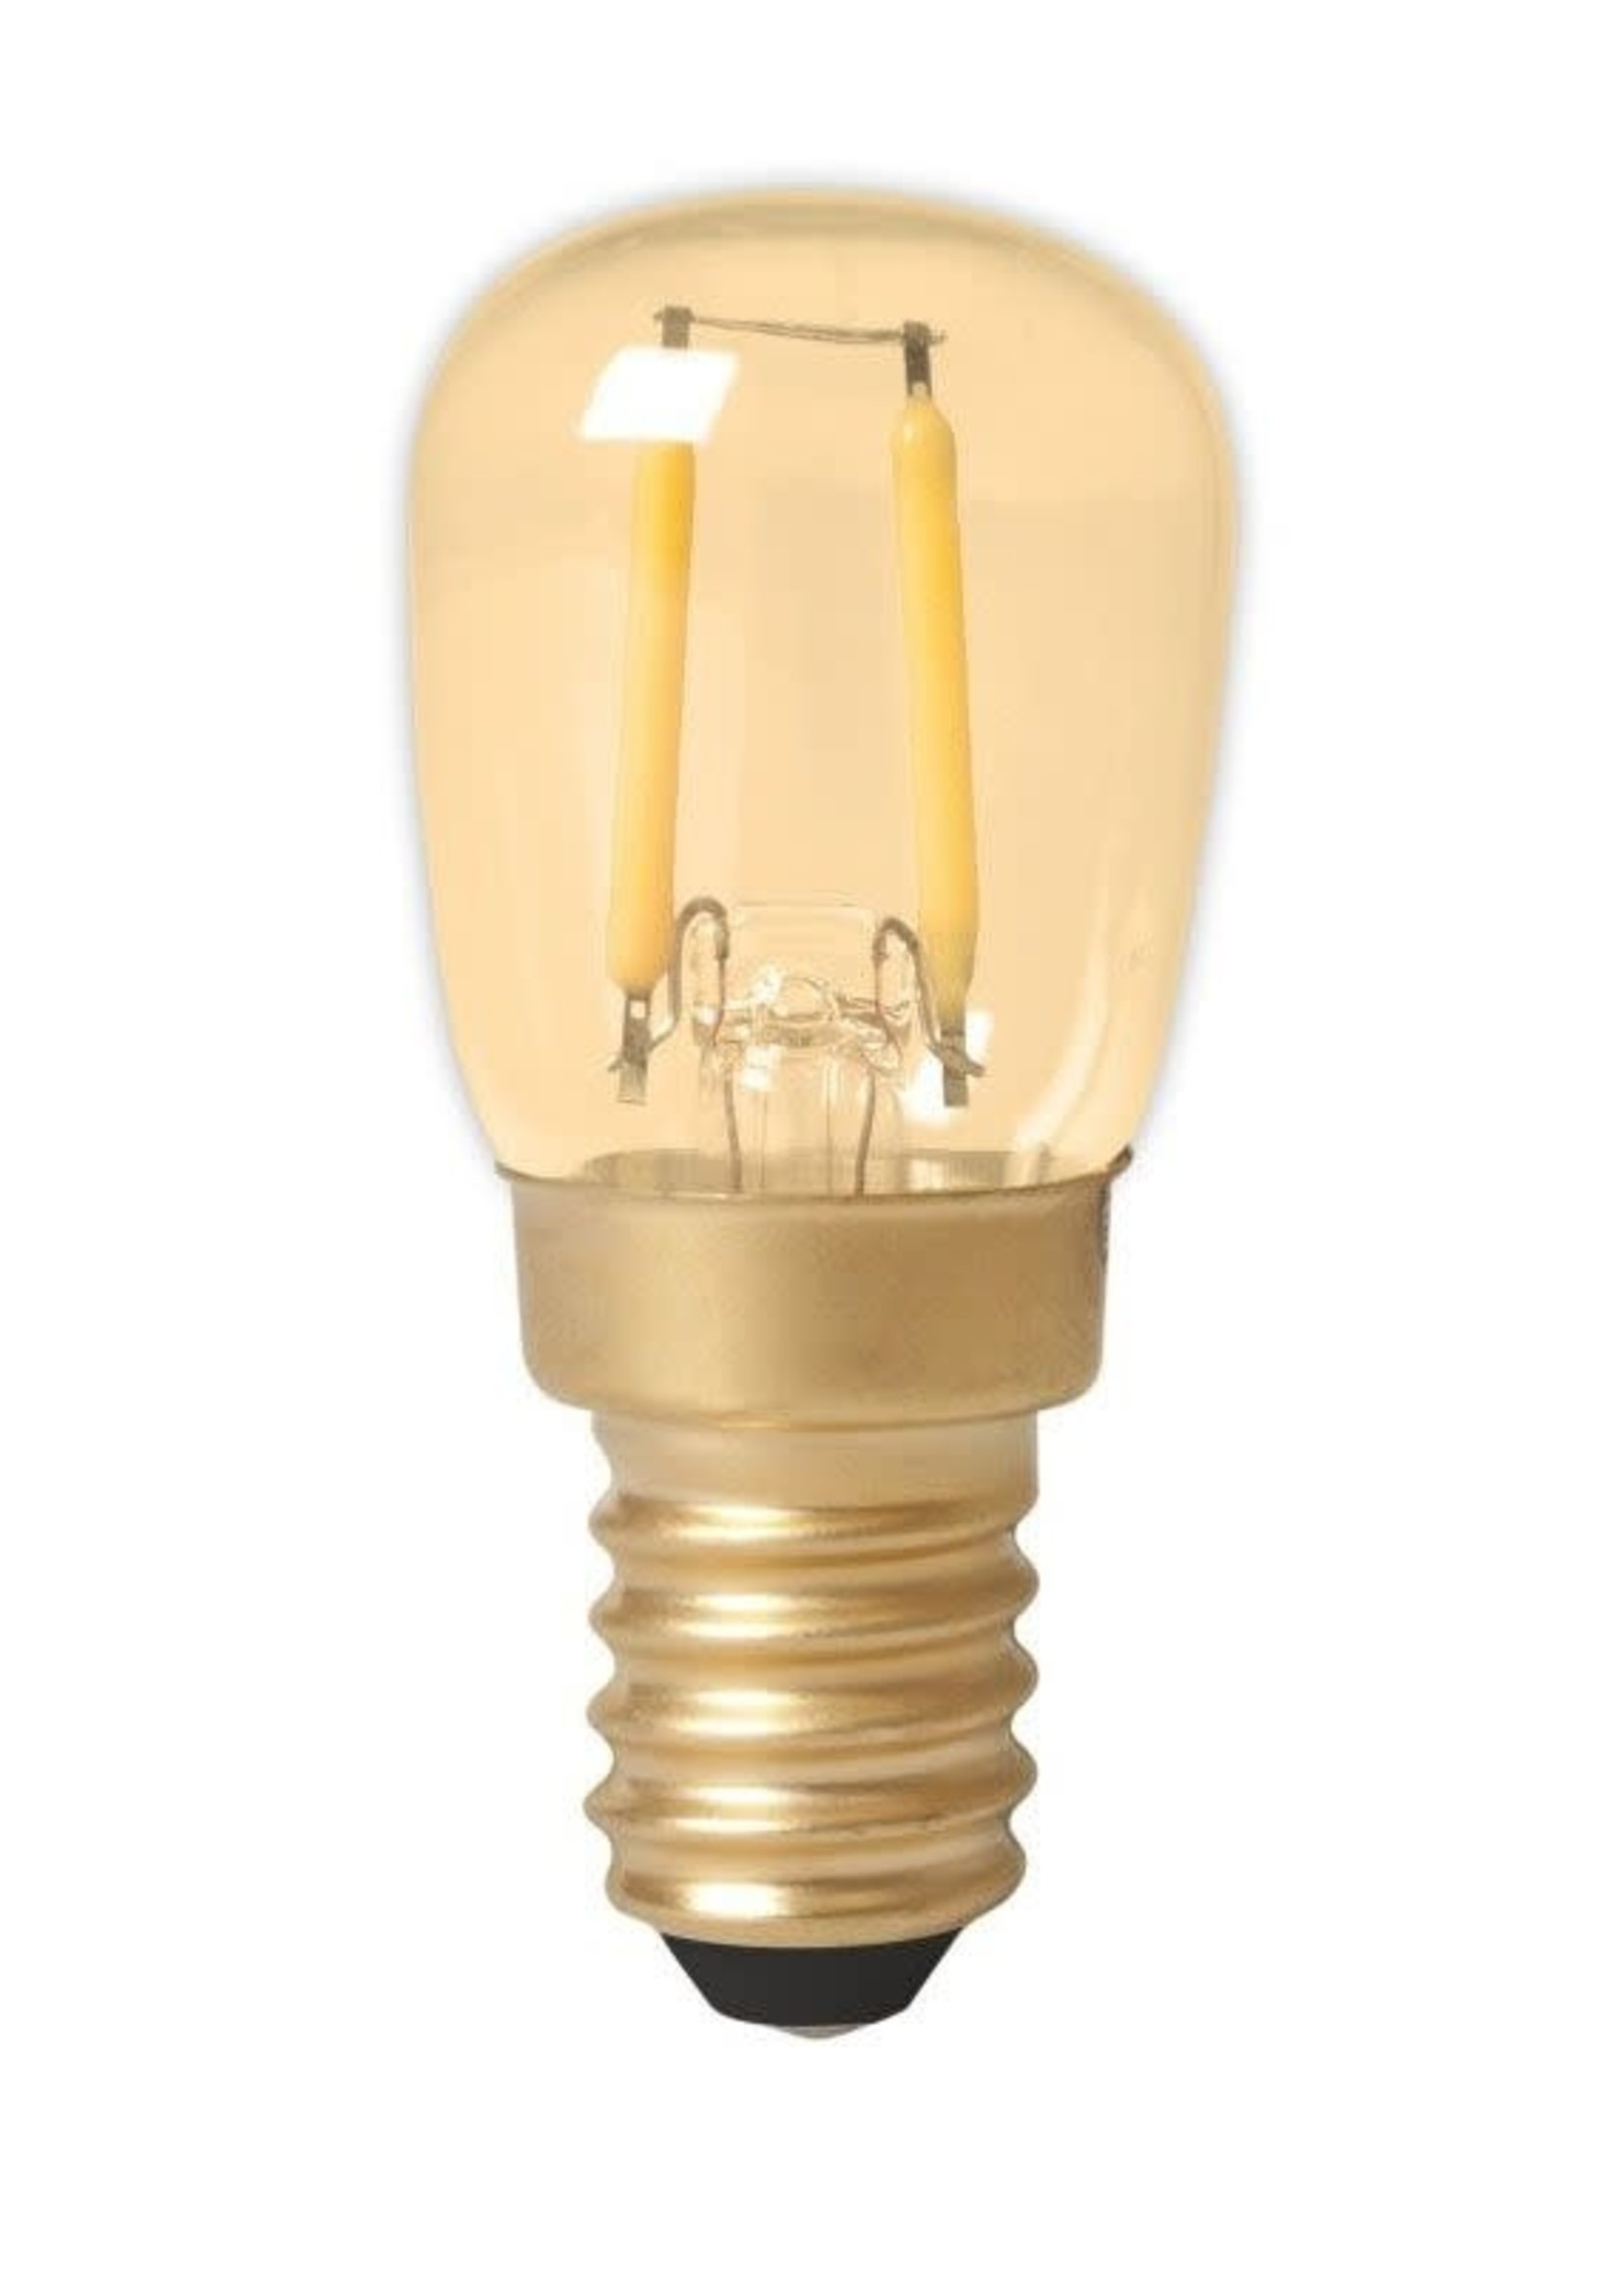 Calex Calex LED volglas Filament Schakelbordlamp 220-240V 1,5W 130lm E14 T26, Goud 2100K CRI80